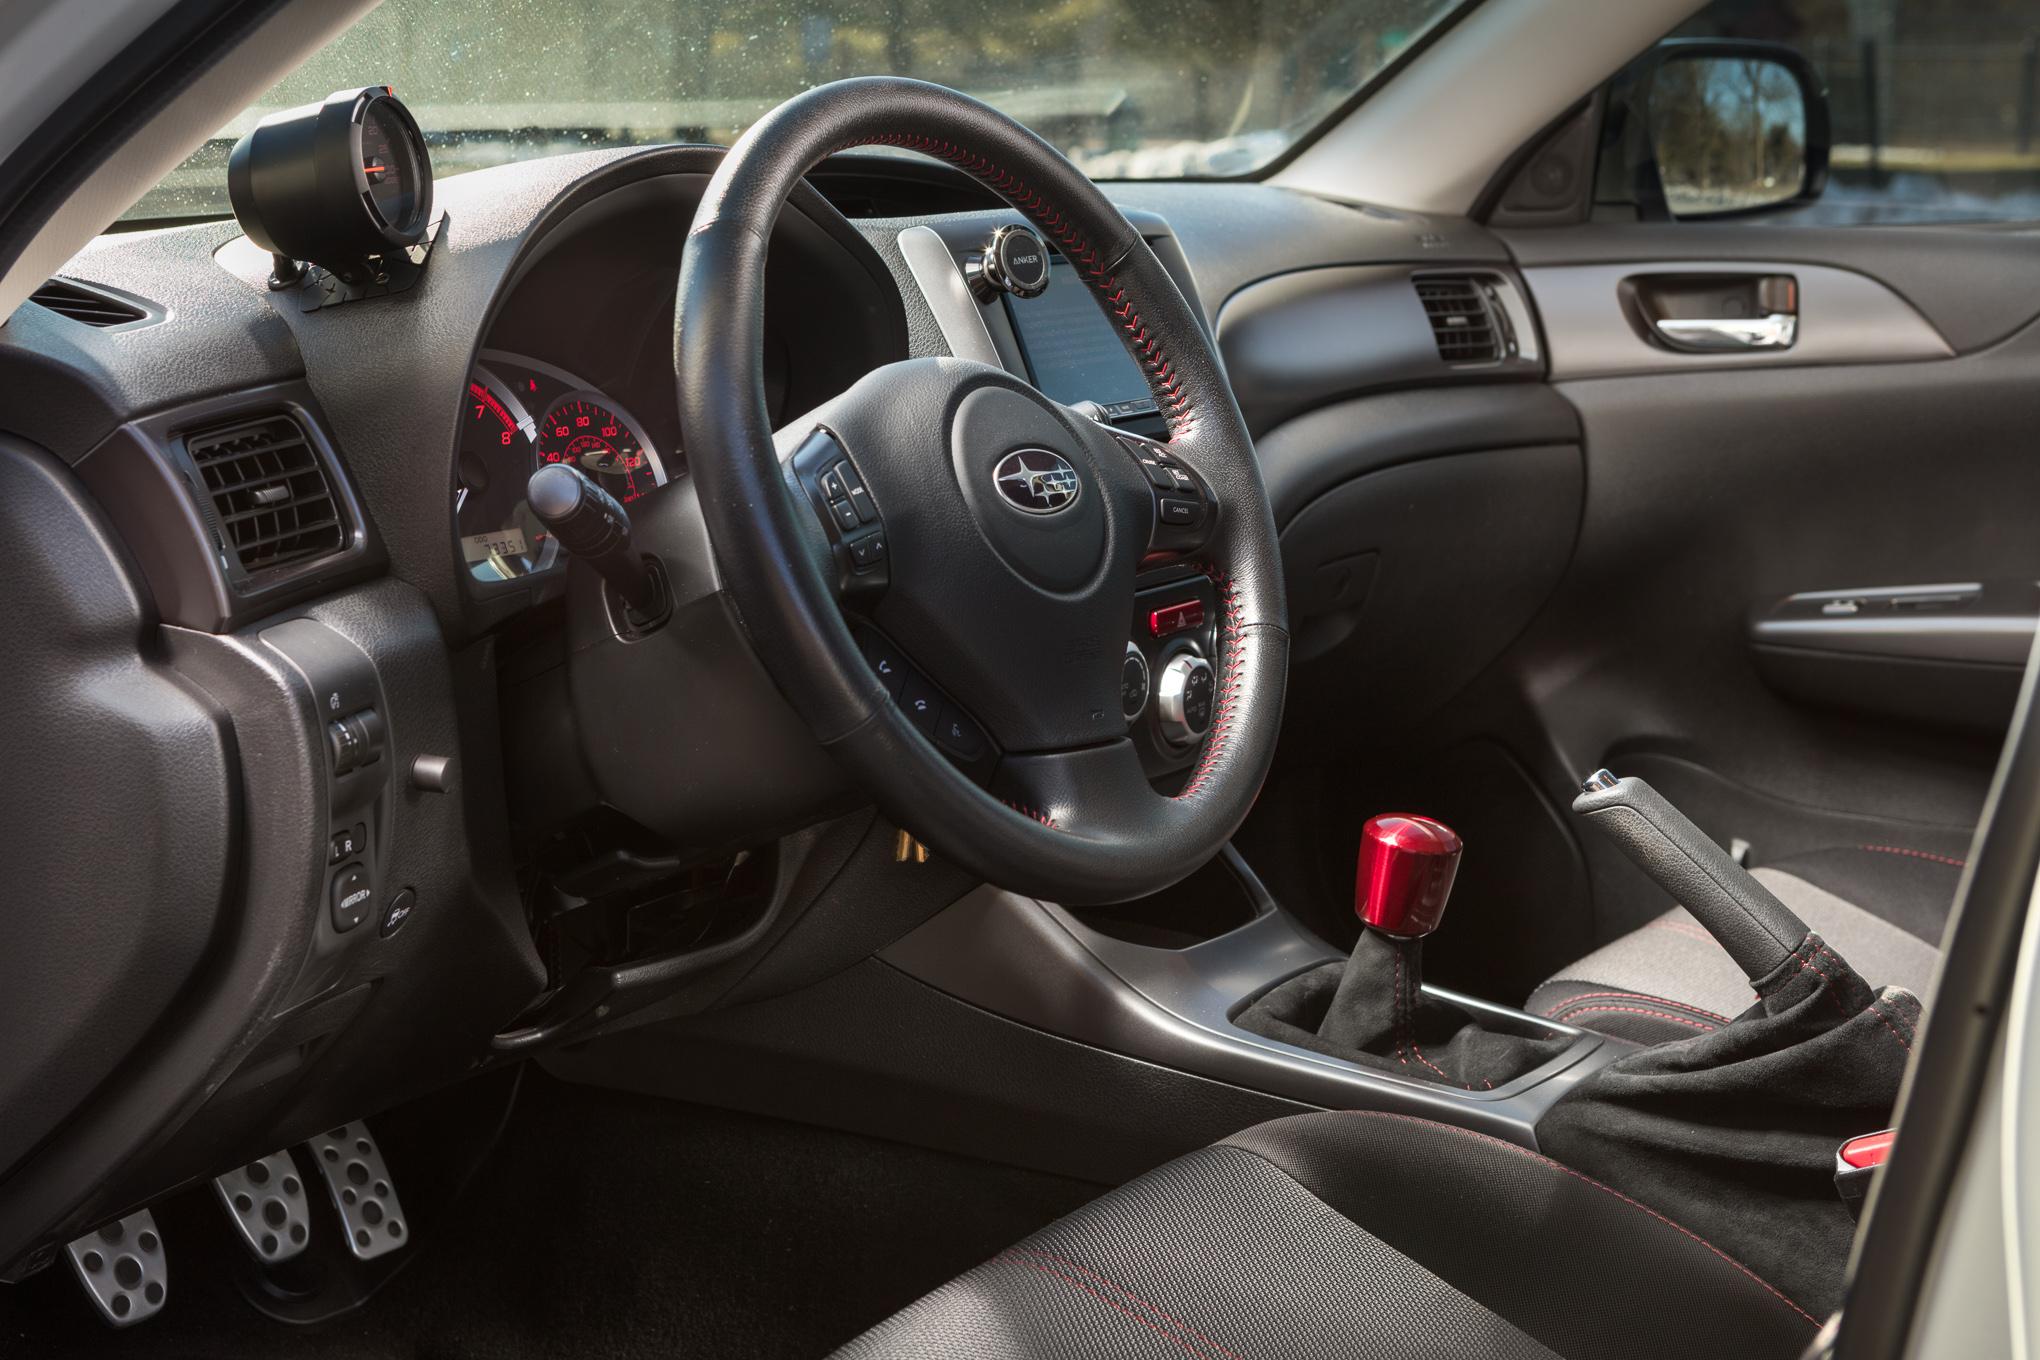 2013 Subaru WRX Hatchback, SWP-2013-subaru-wrx-0106-web-jpg